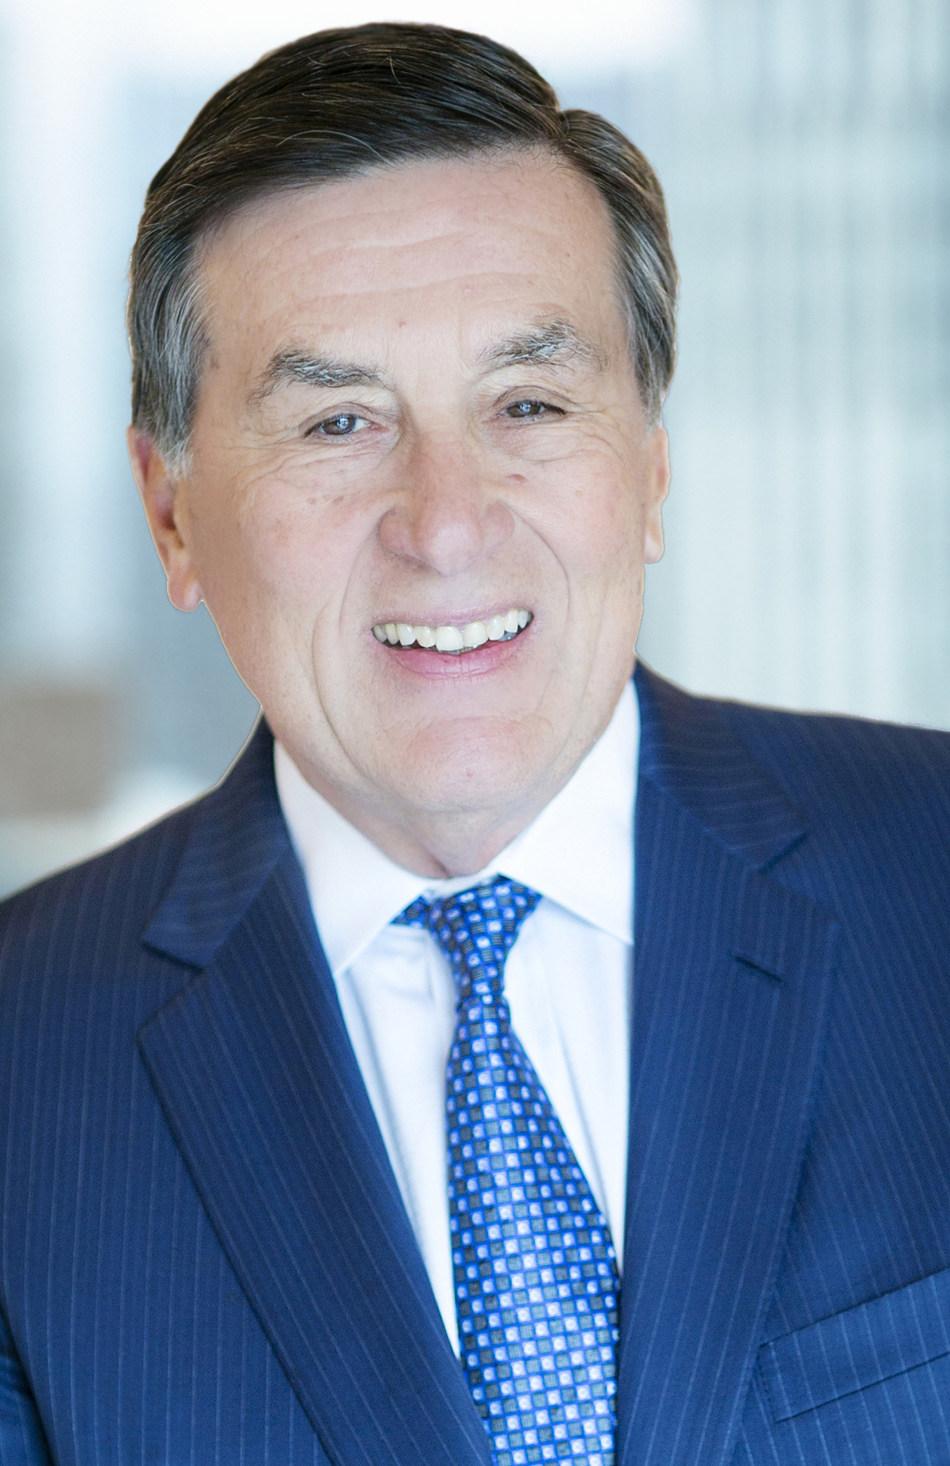 Frederic V. Salerno announces retirement as chairman of the board, Akamai Technologies, Inc.